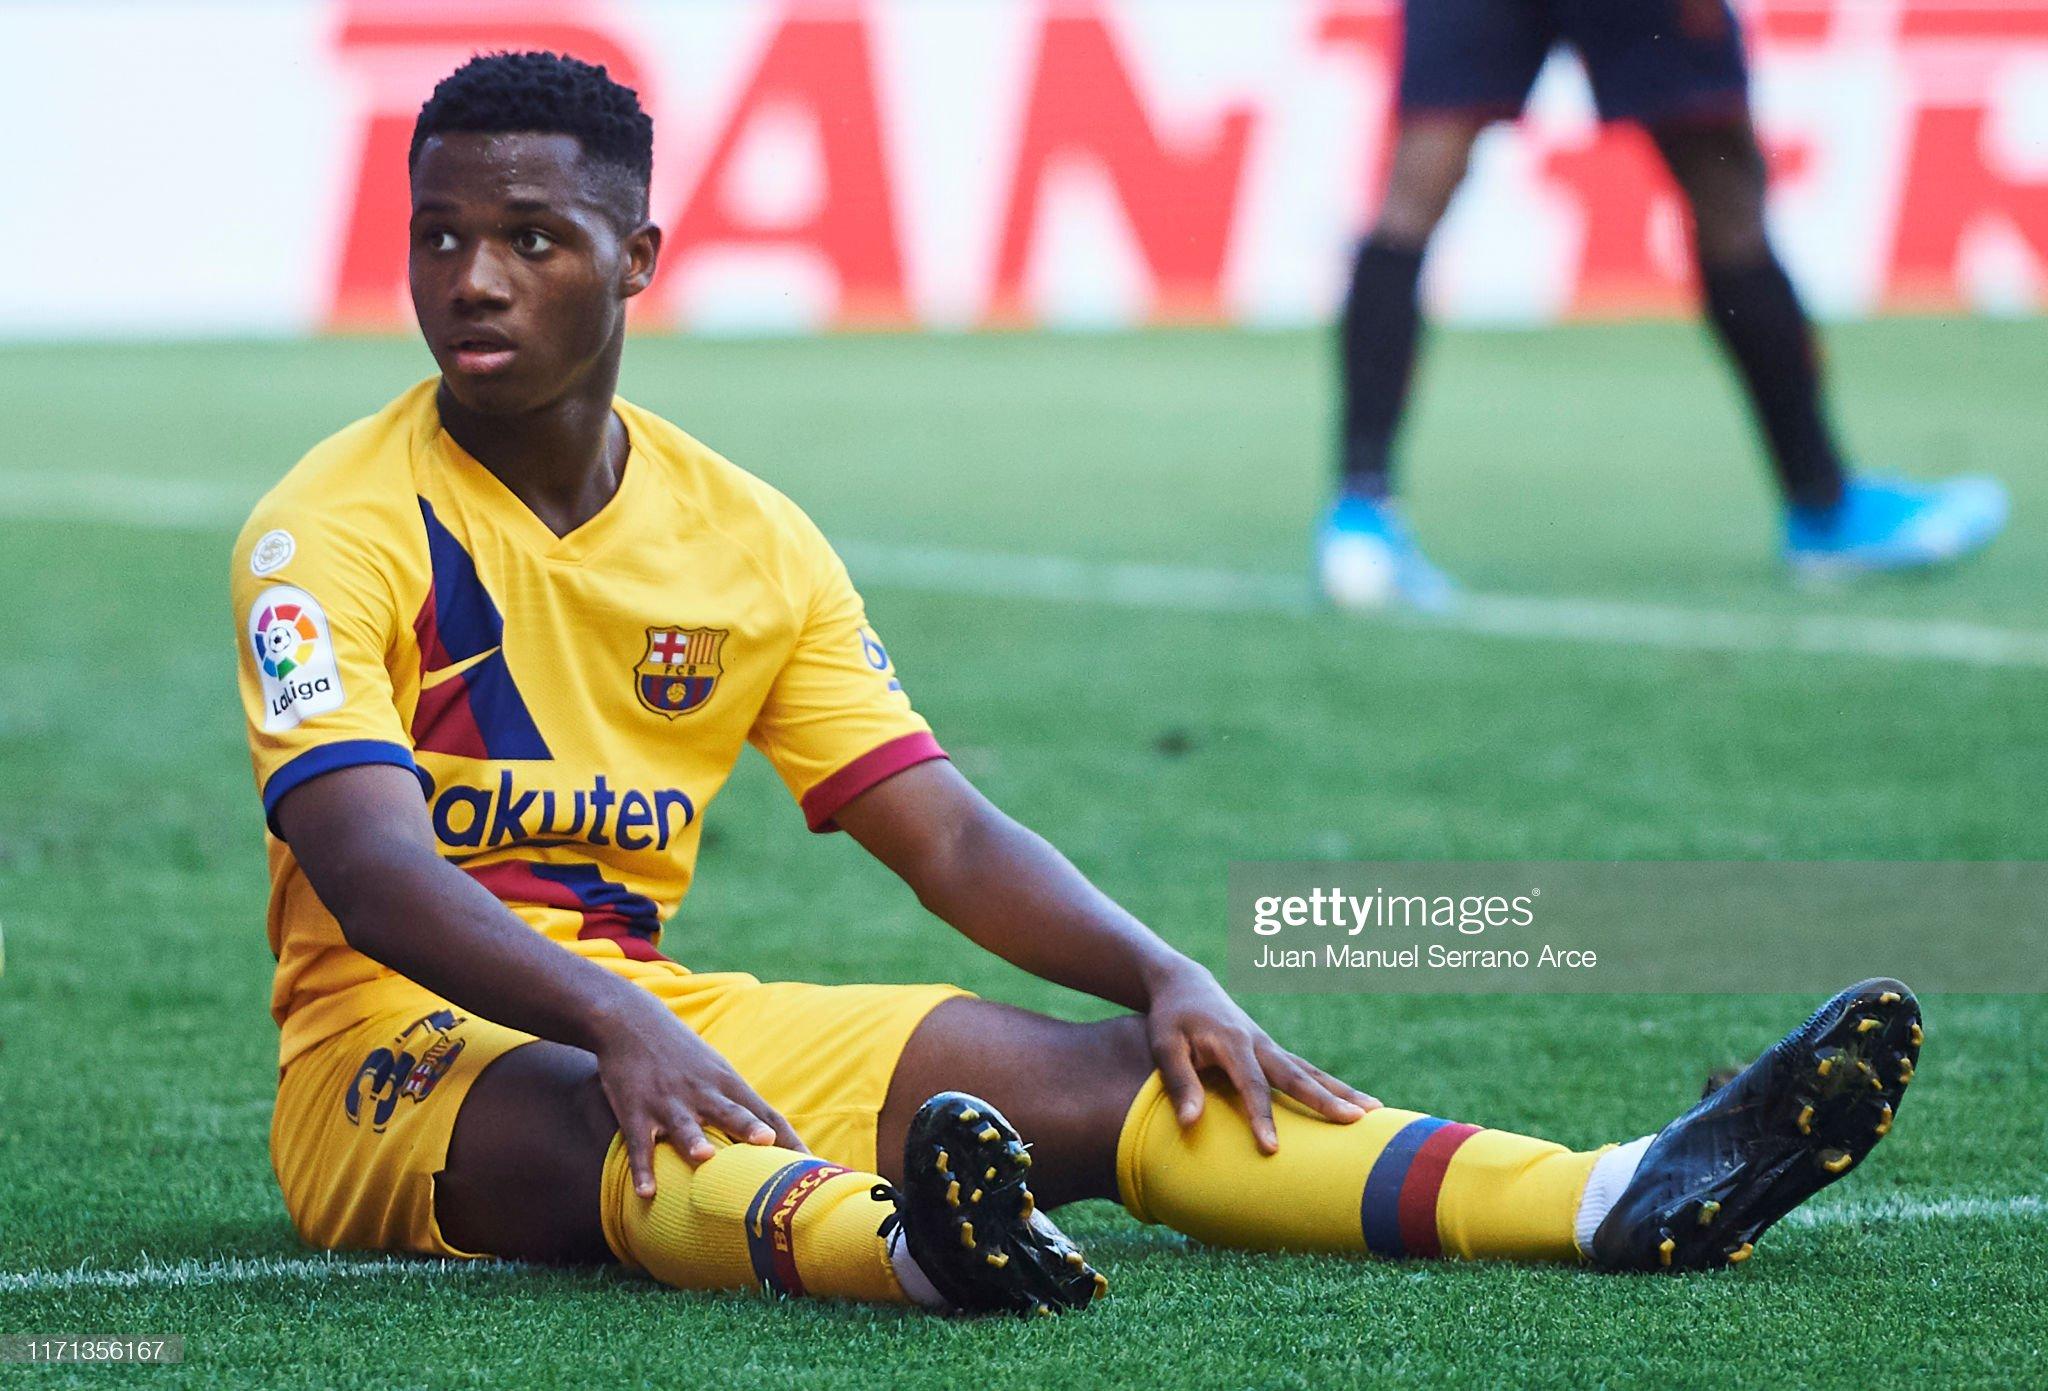 صور مباراة : أوساسونا - برشلونة 2-2 ( 31-08-2019 )  Anssumane-fati-of-fc-barcelona-reacts-during-the-liga-match-between-picture-id1171356167?s=2048x2048